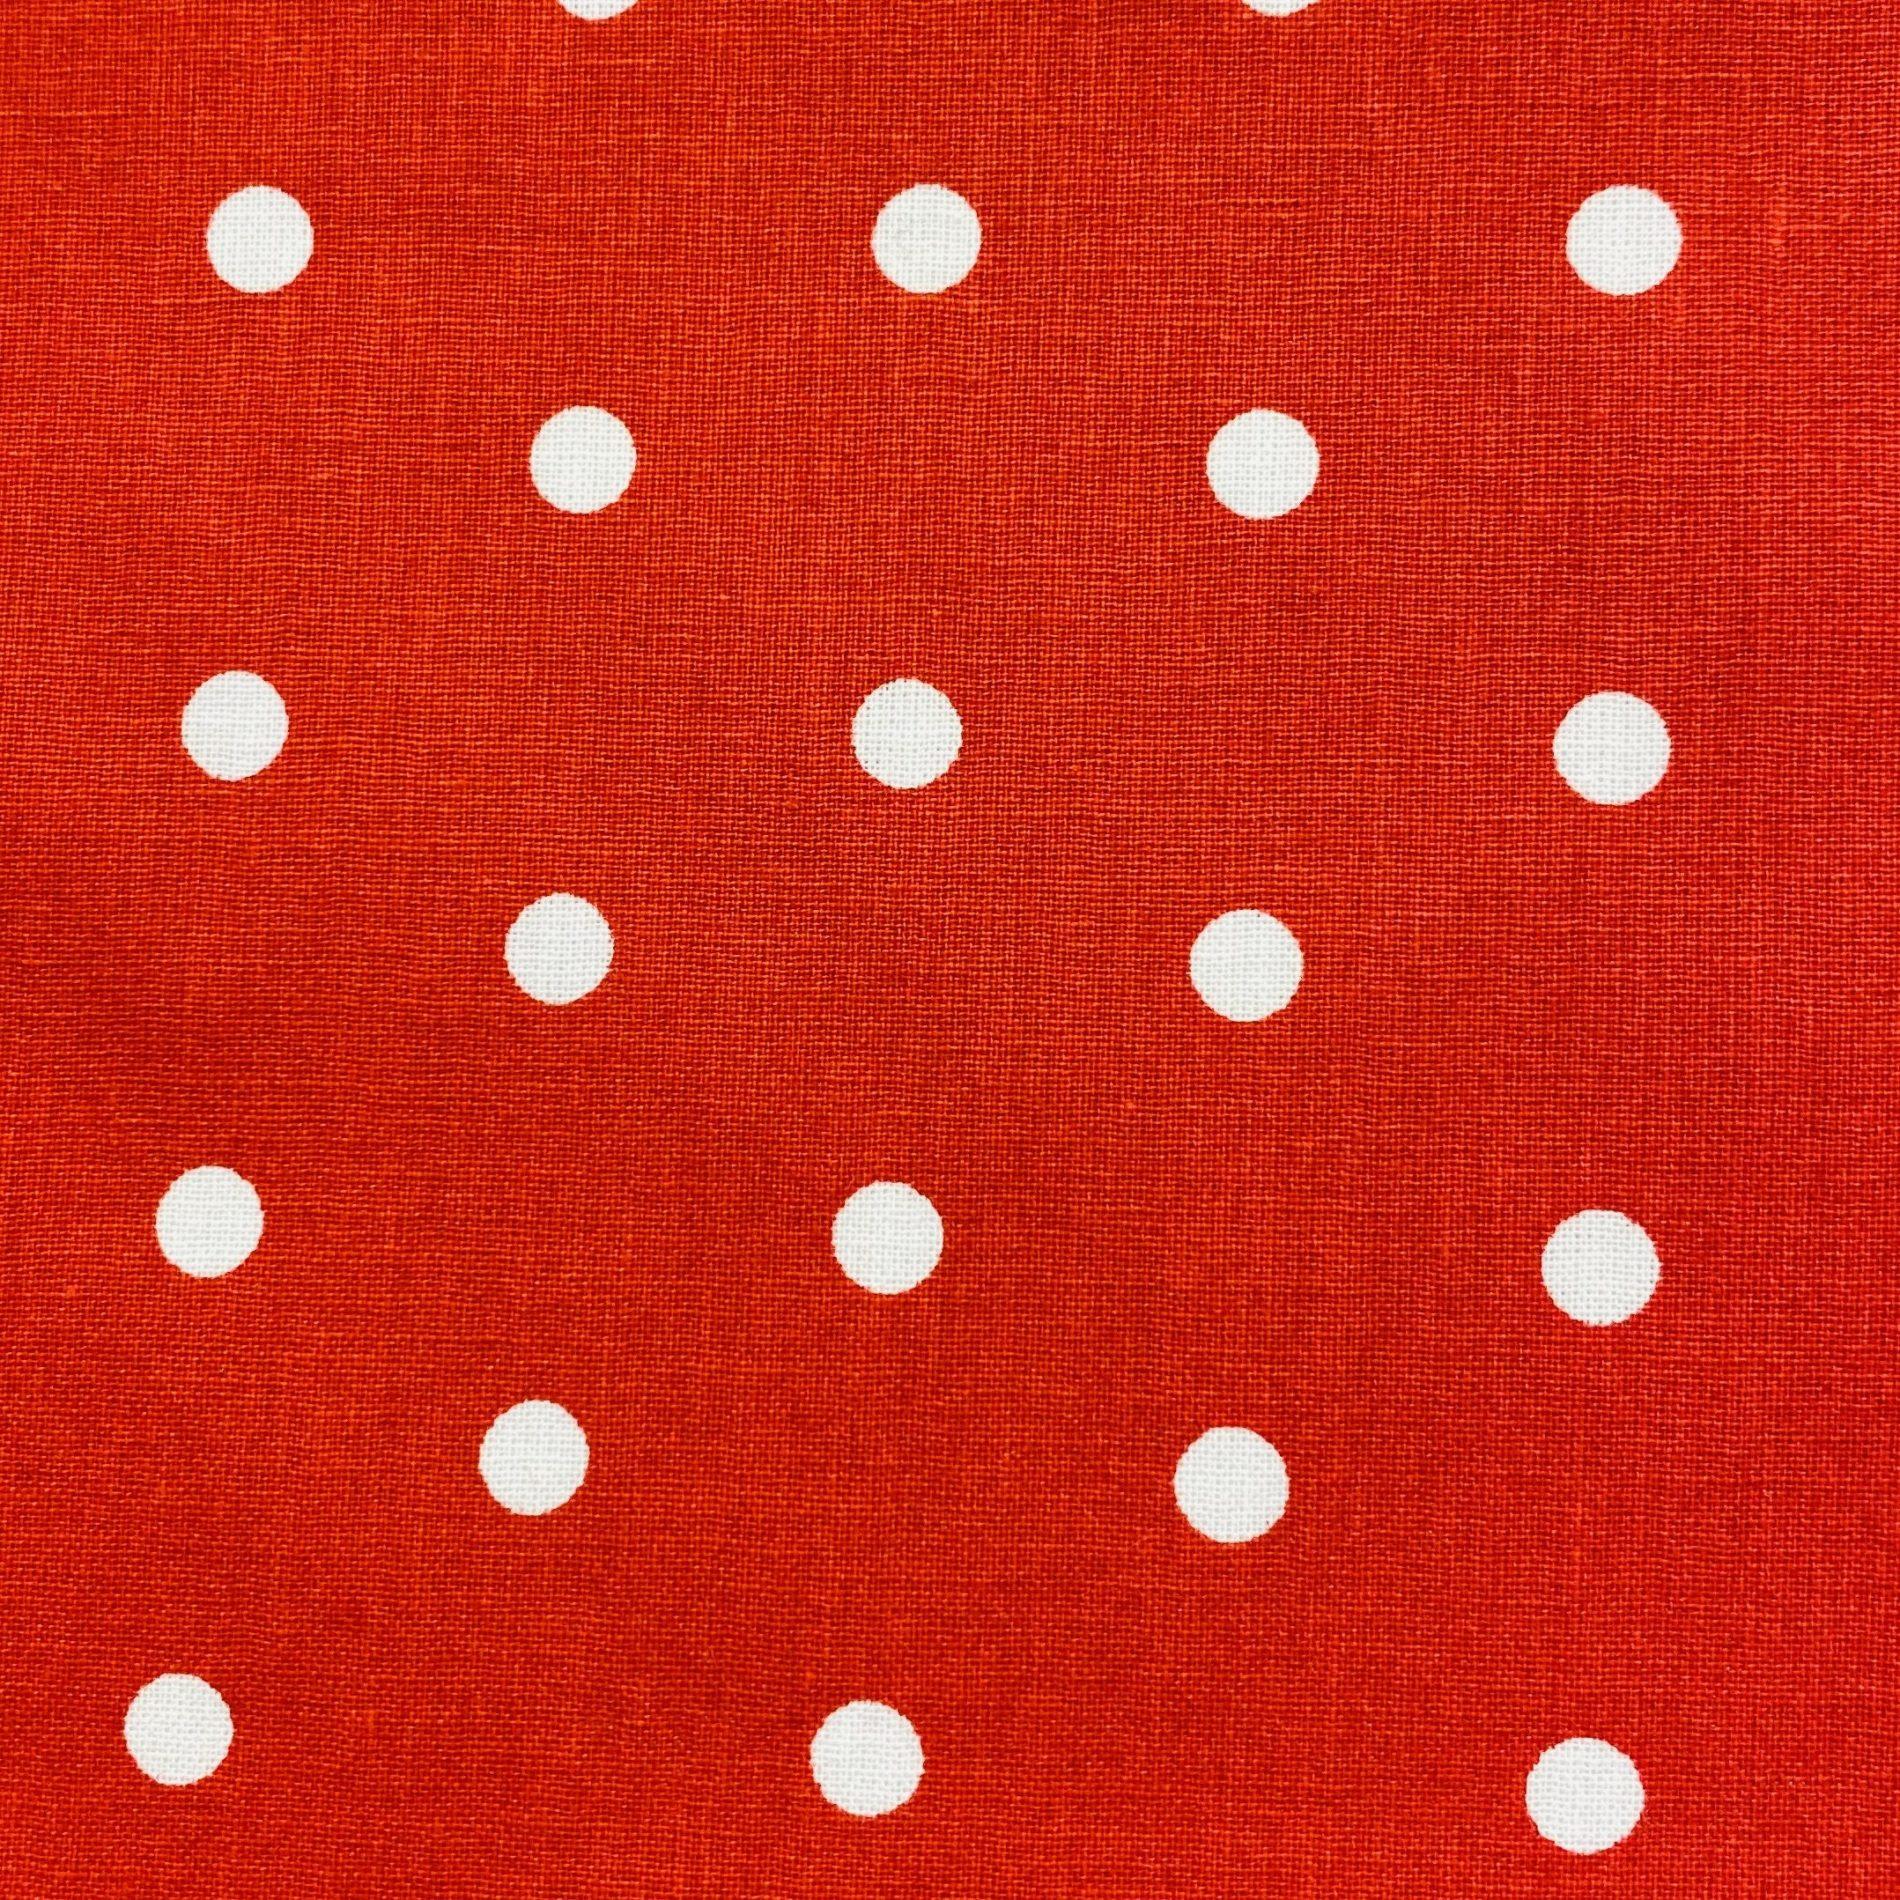 Poppins blanc fond rouge